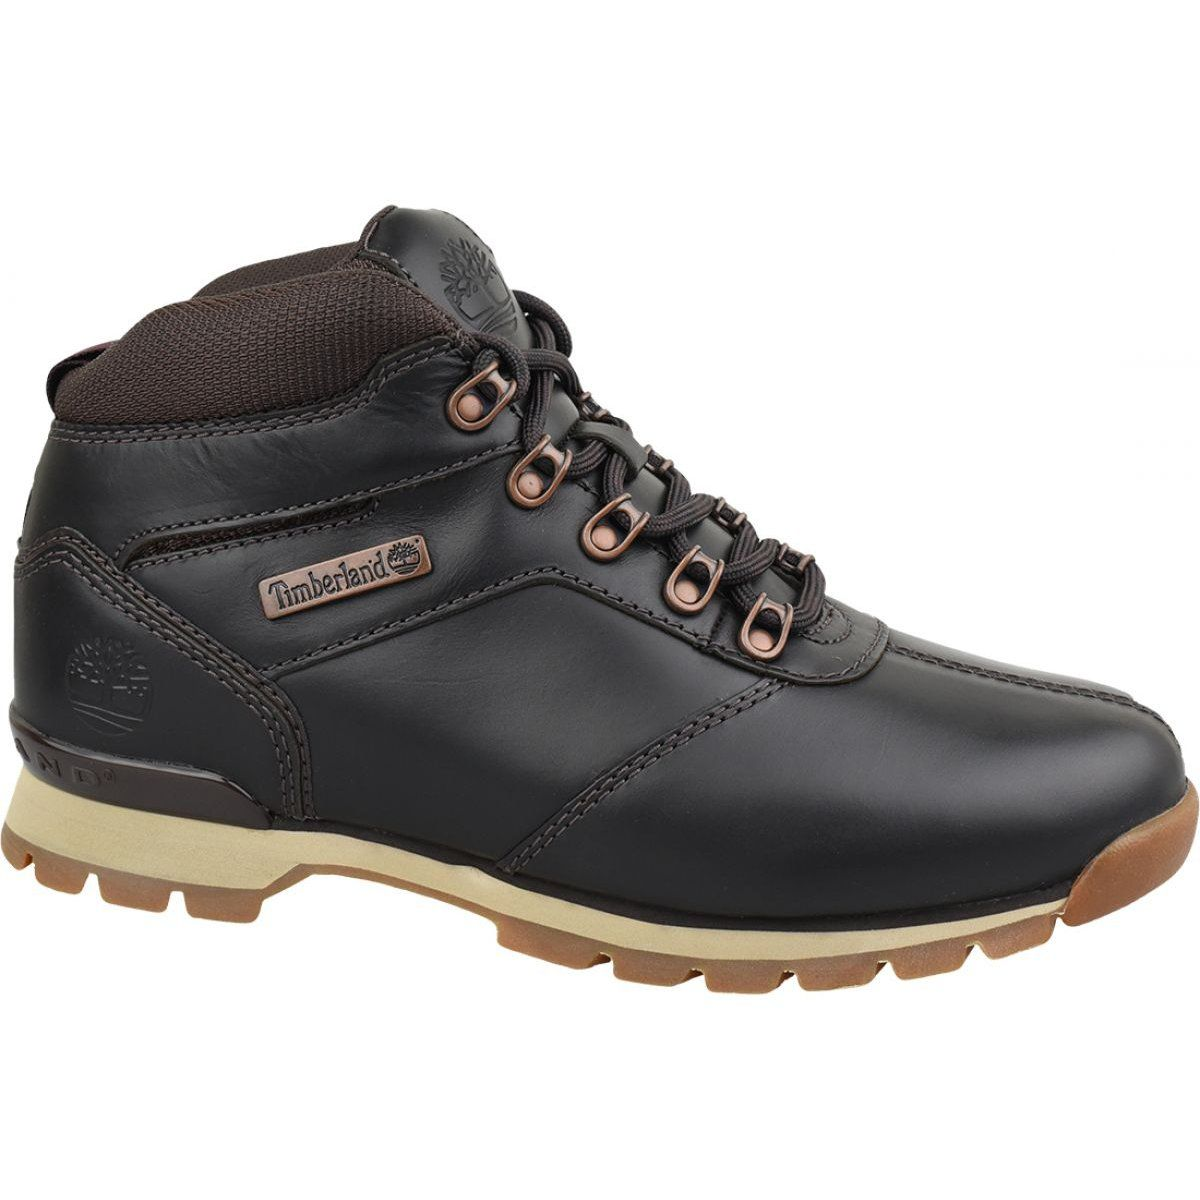 Timberland Splitrock 2 M A21ke Shoes Brown Timberland Mens Shoes Shoes Timberlands Shoes